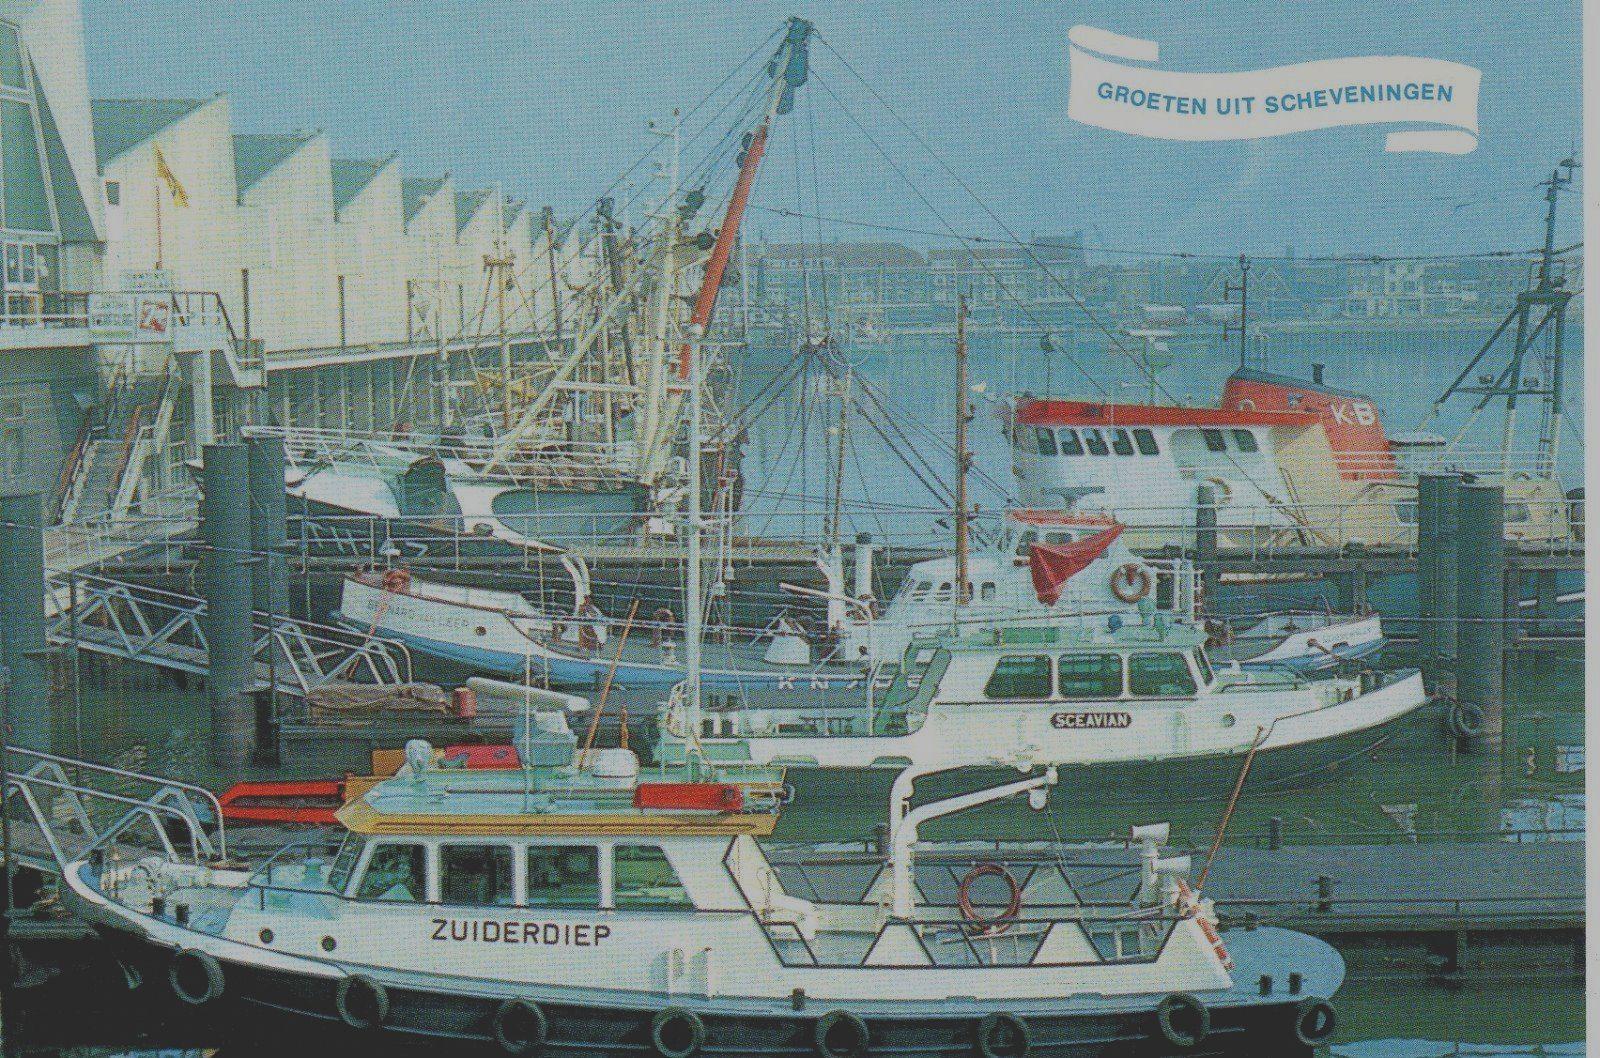 http://www.ebay.com/itm/Old-Postcard-Scheviningen-Harbour-Holland-/272275145413?hash=item3f64dd02c5:g:oc8AAOSw1DtXLjgj